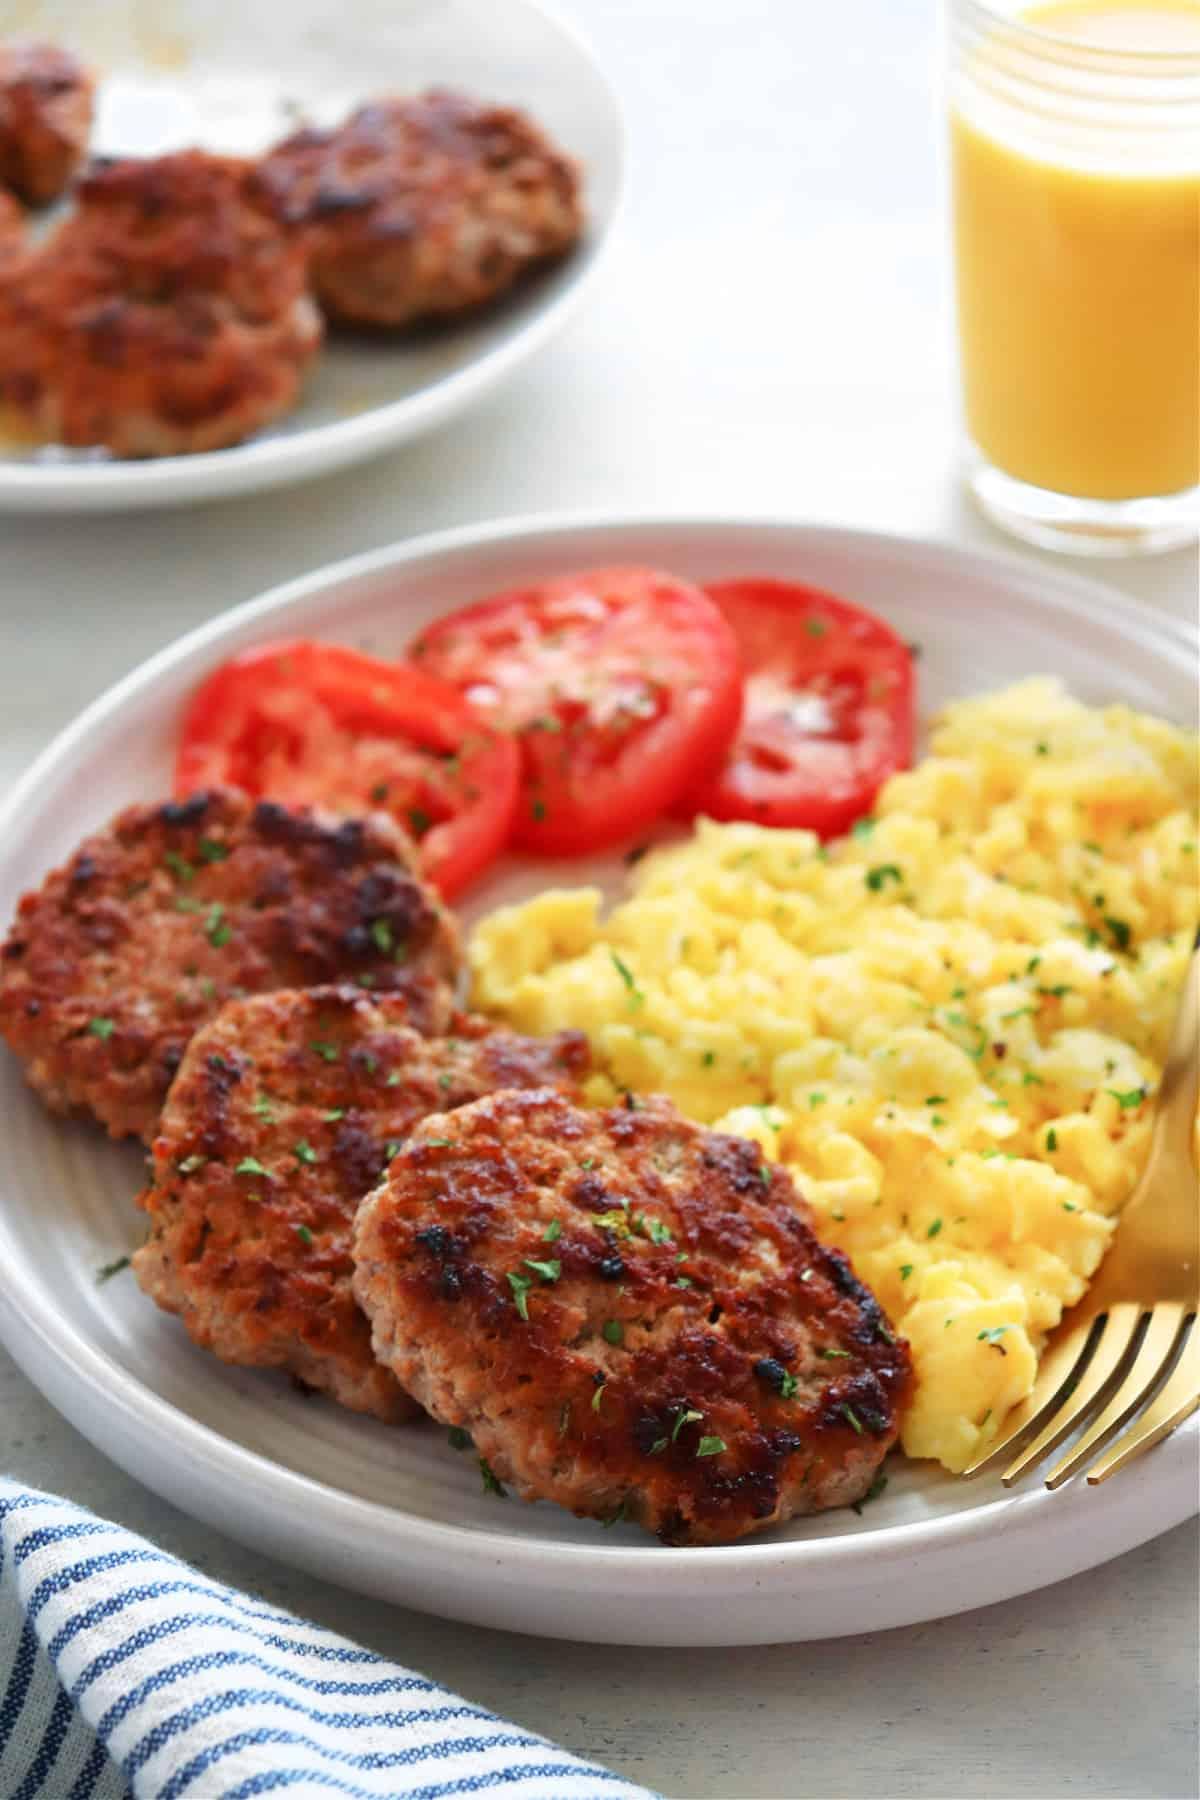 breakfast sausage 1 Homemade Breakfast Sausage Recipe